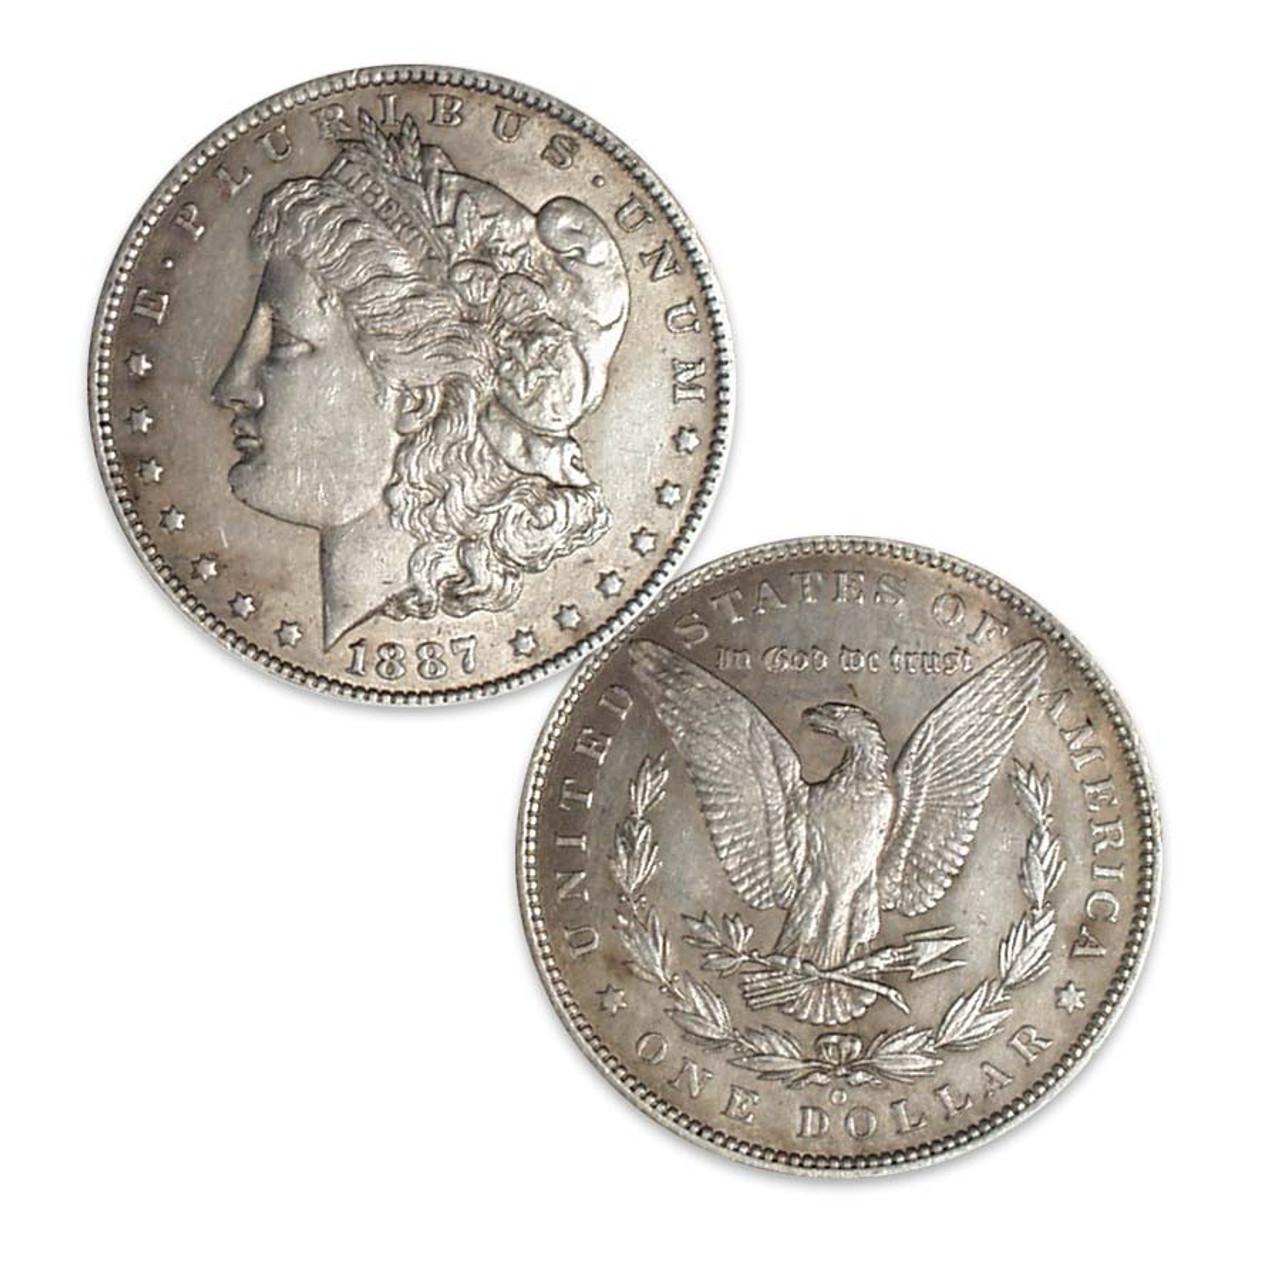 1887-O Morgan Silver Dollar About Uncirculated